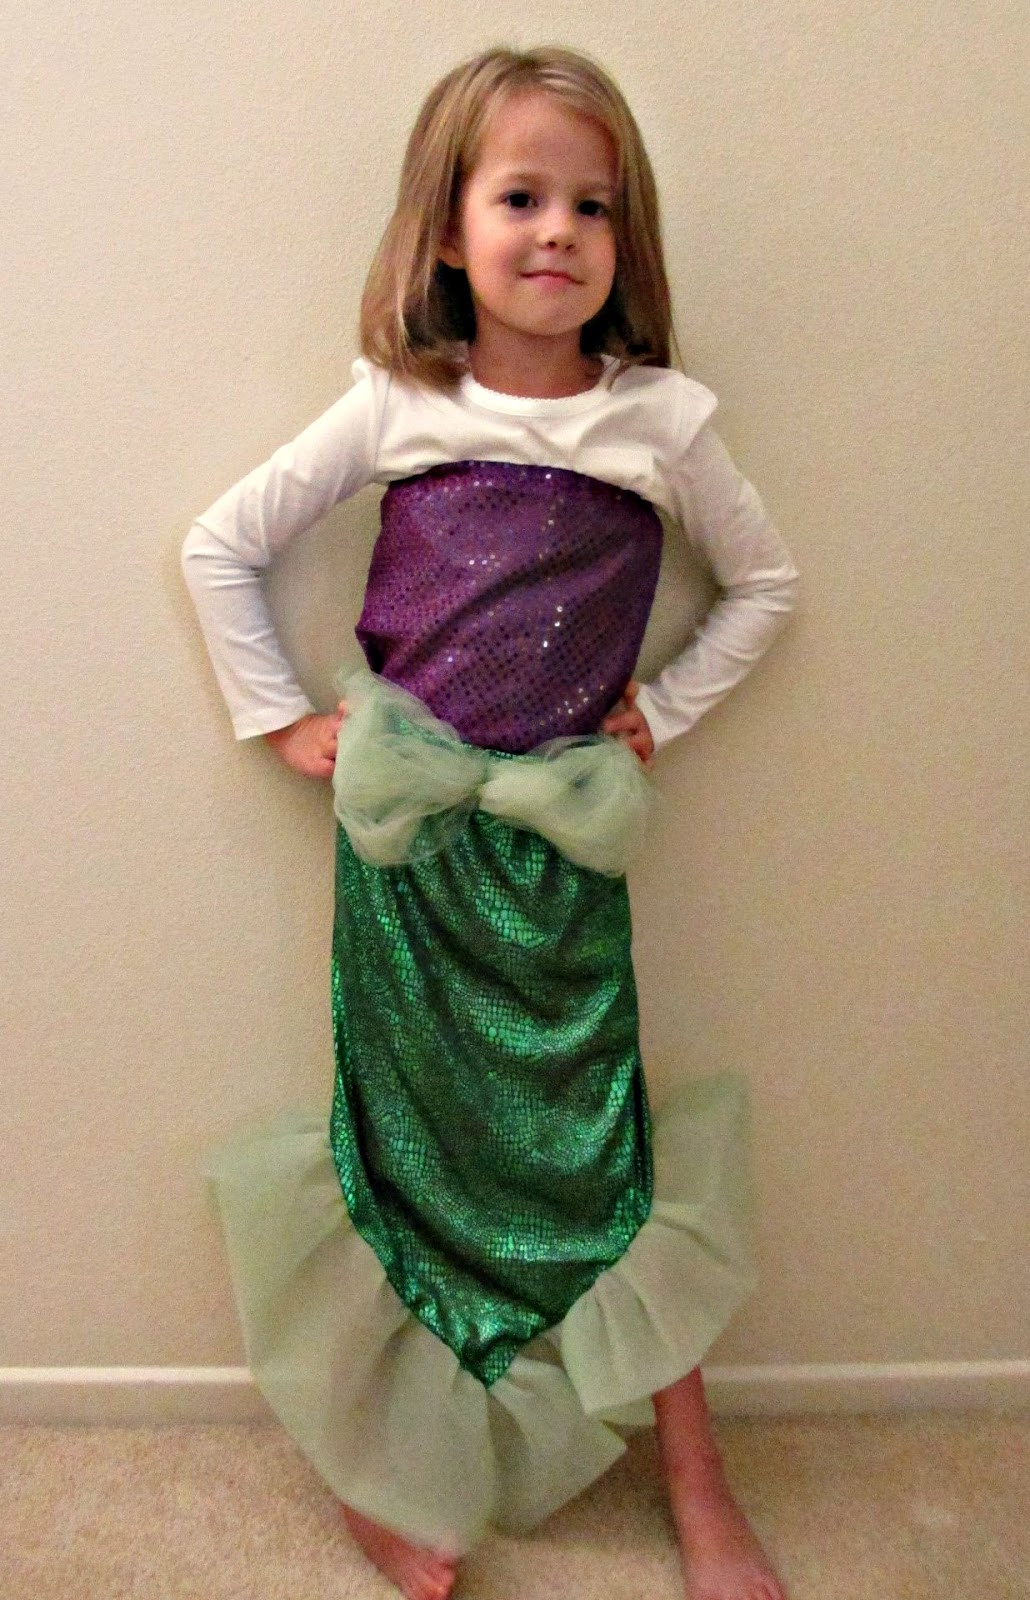 Mermaid DIY Costumes  Chadwicks Picture Place Homemade Mermaid Costume